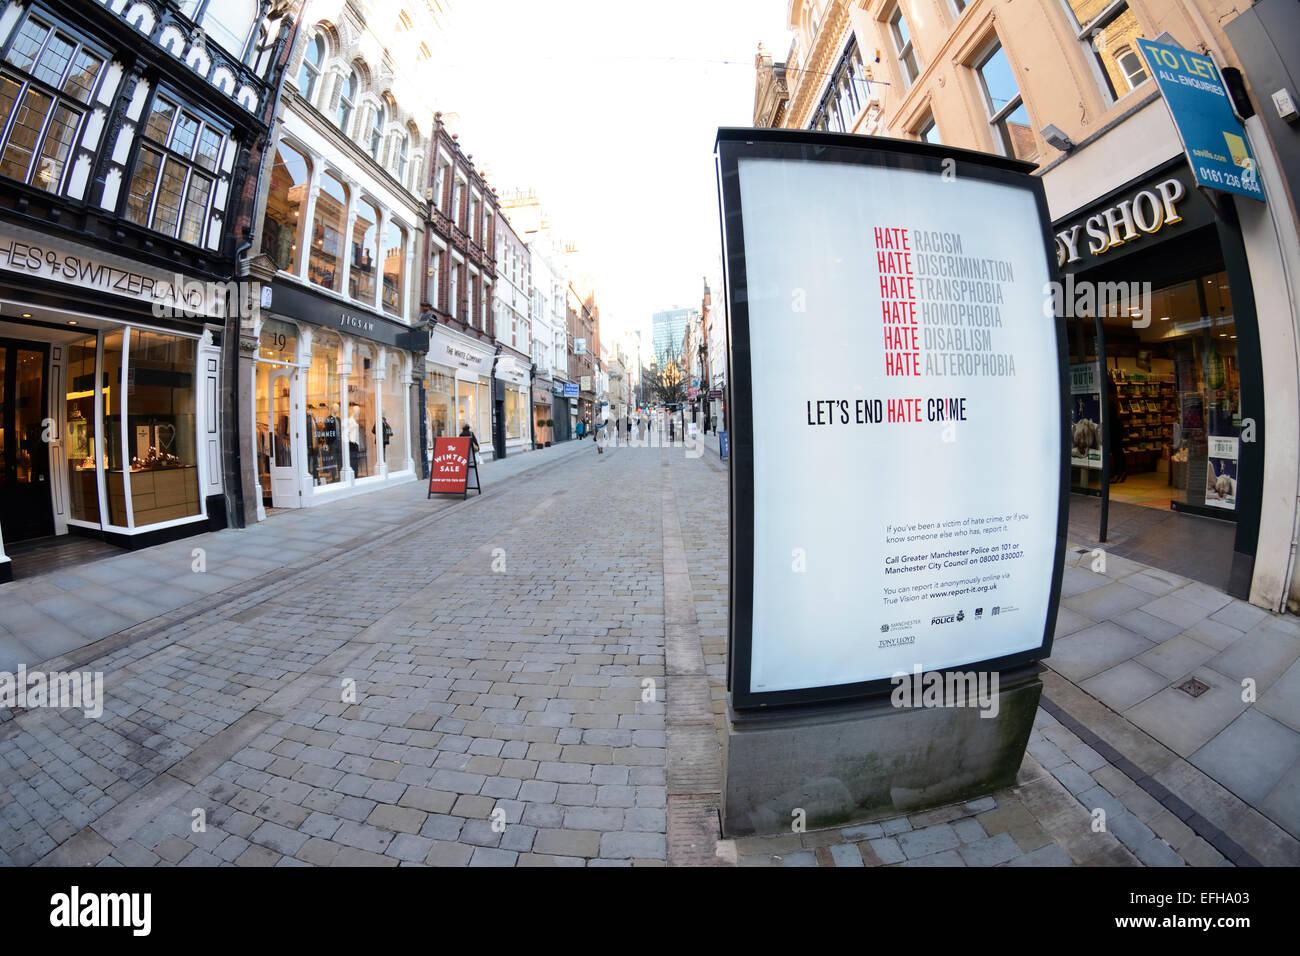 "Enseigne lumineuse contre la haine ""rimes"" dans King Street, Manchester. Photo Stock"